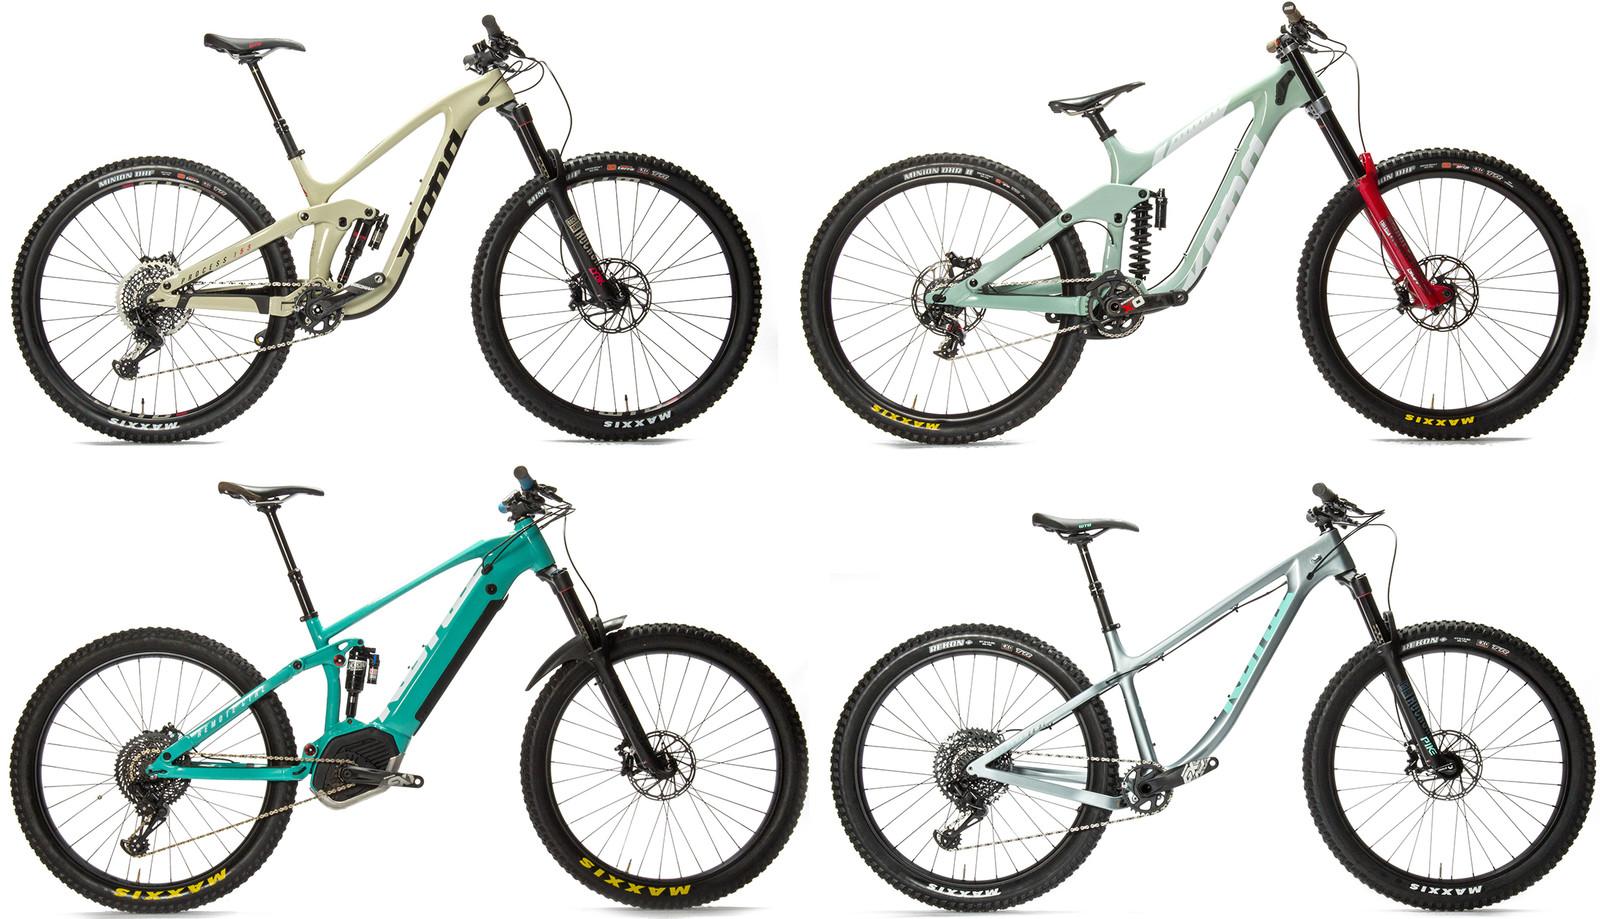 Kona Introduces Five Fun New Bikes - Sea Otter Classic